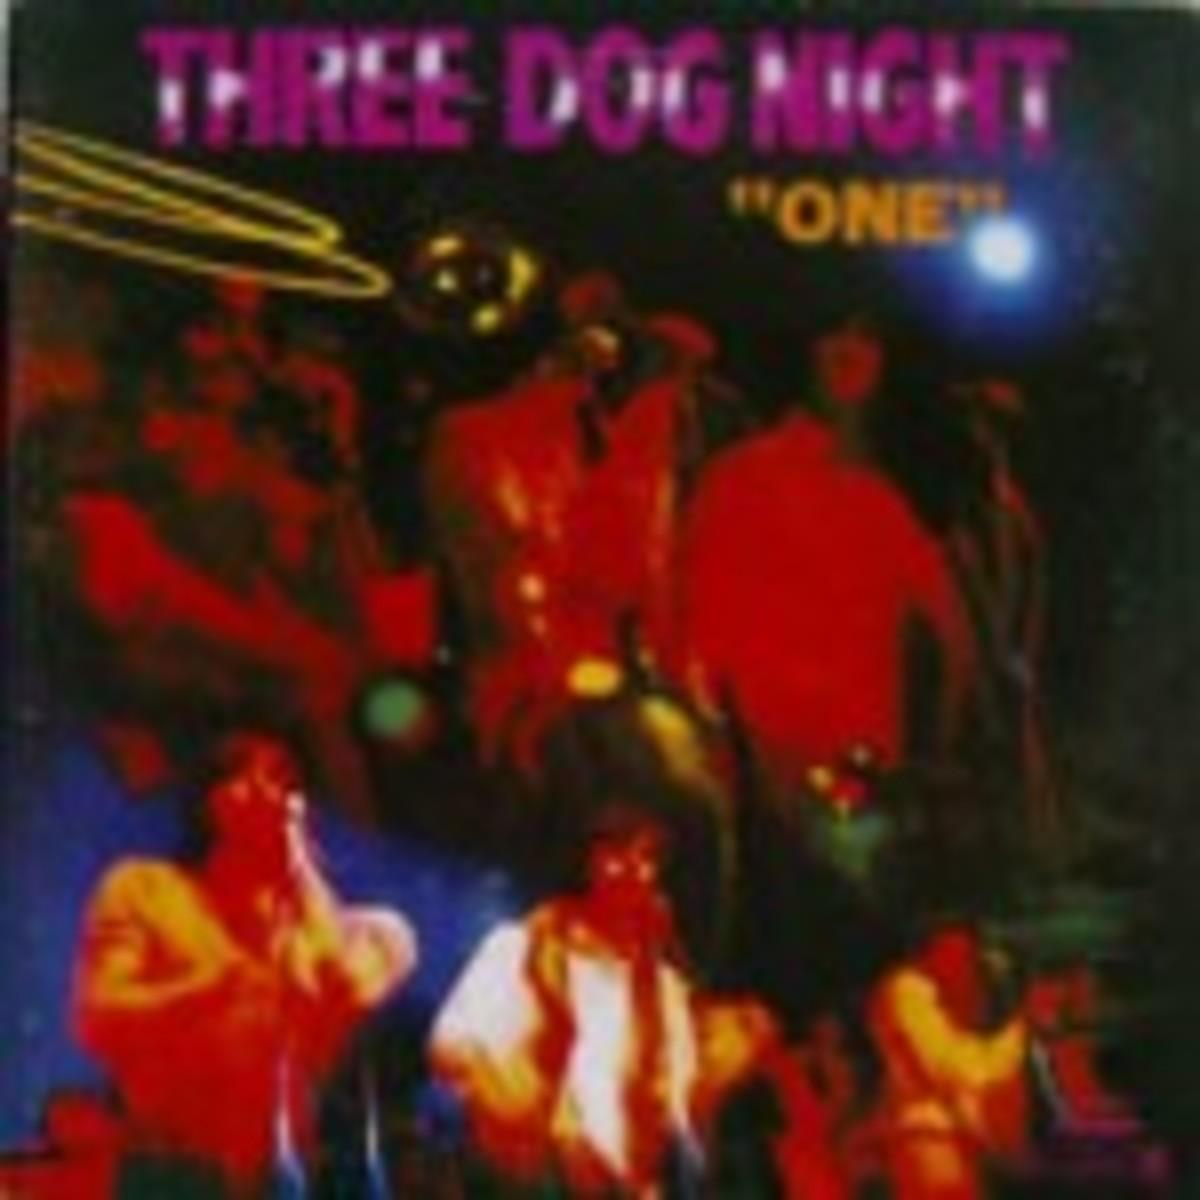 ThreeDogNight_One